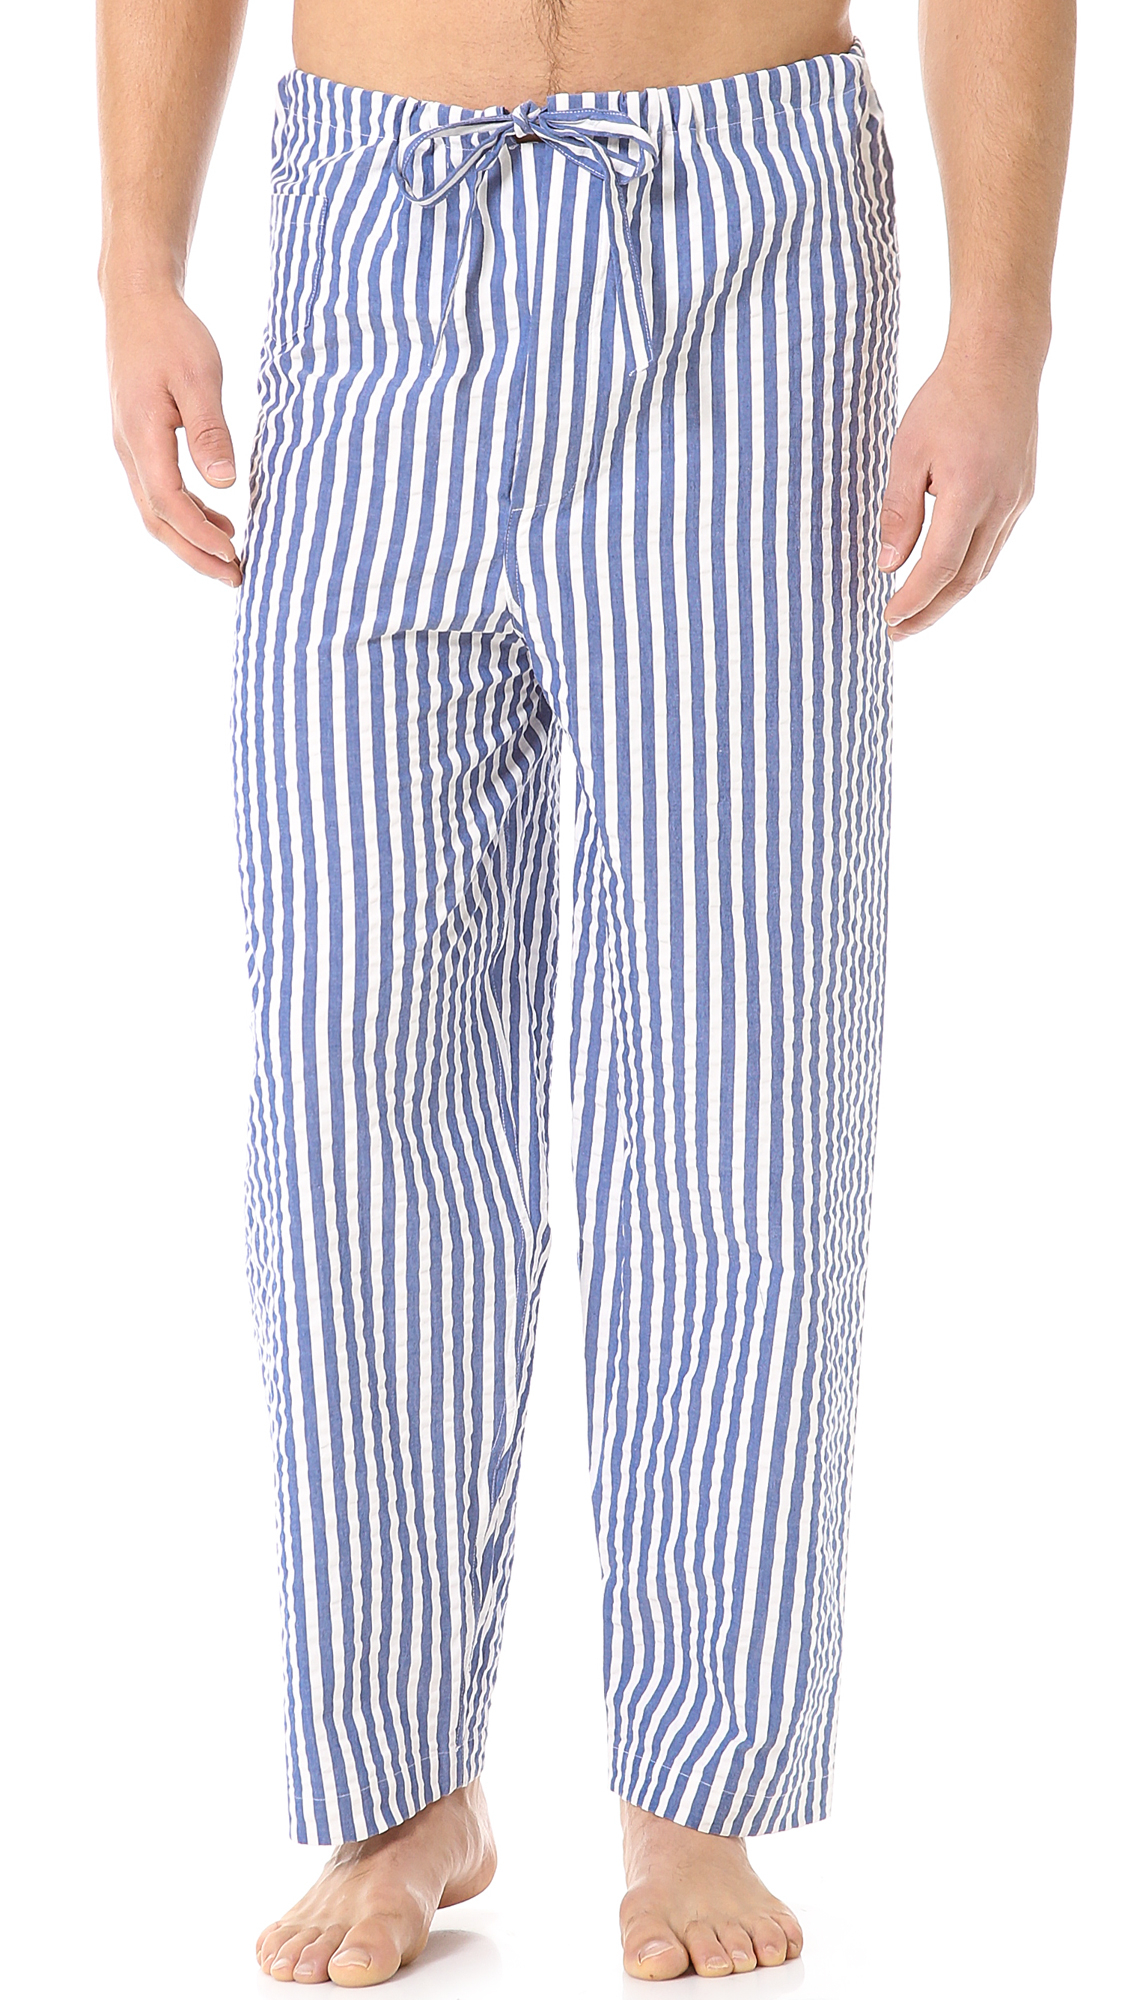 Lyst - Alexander Olch Seersucker Pajama Set in Blue for Men d88b9884e